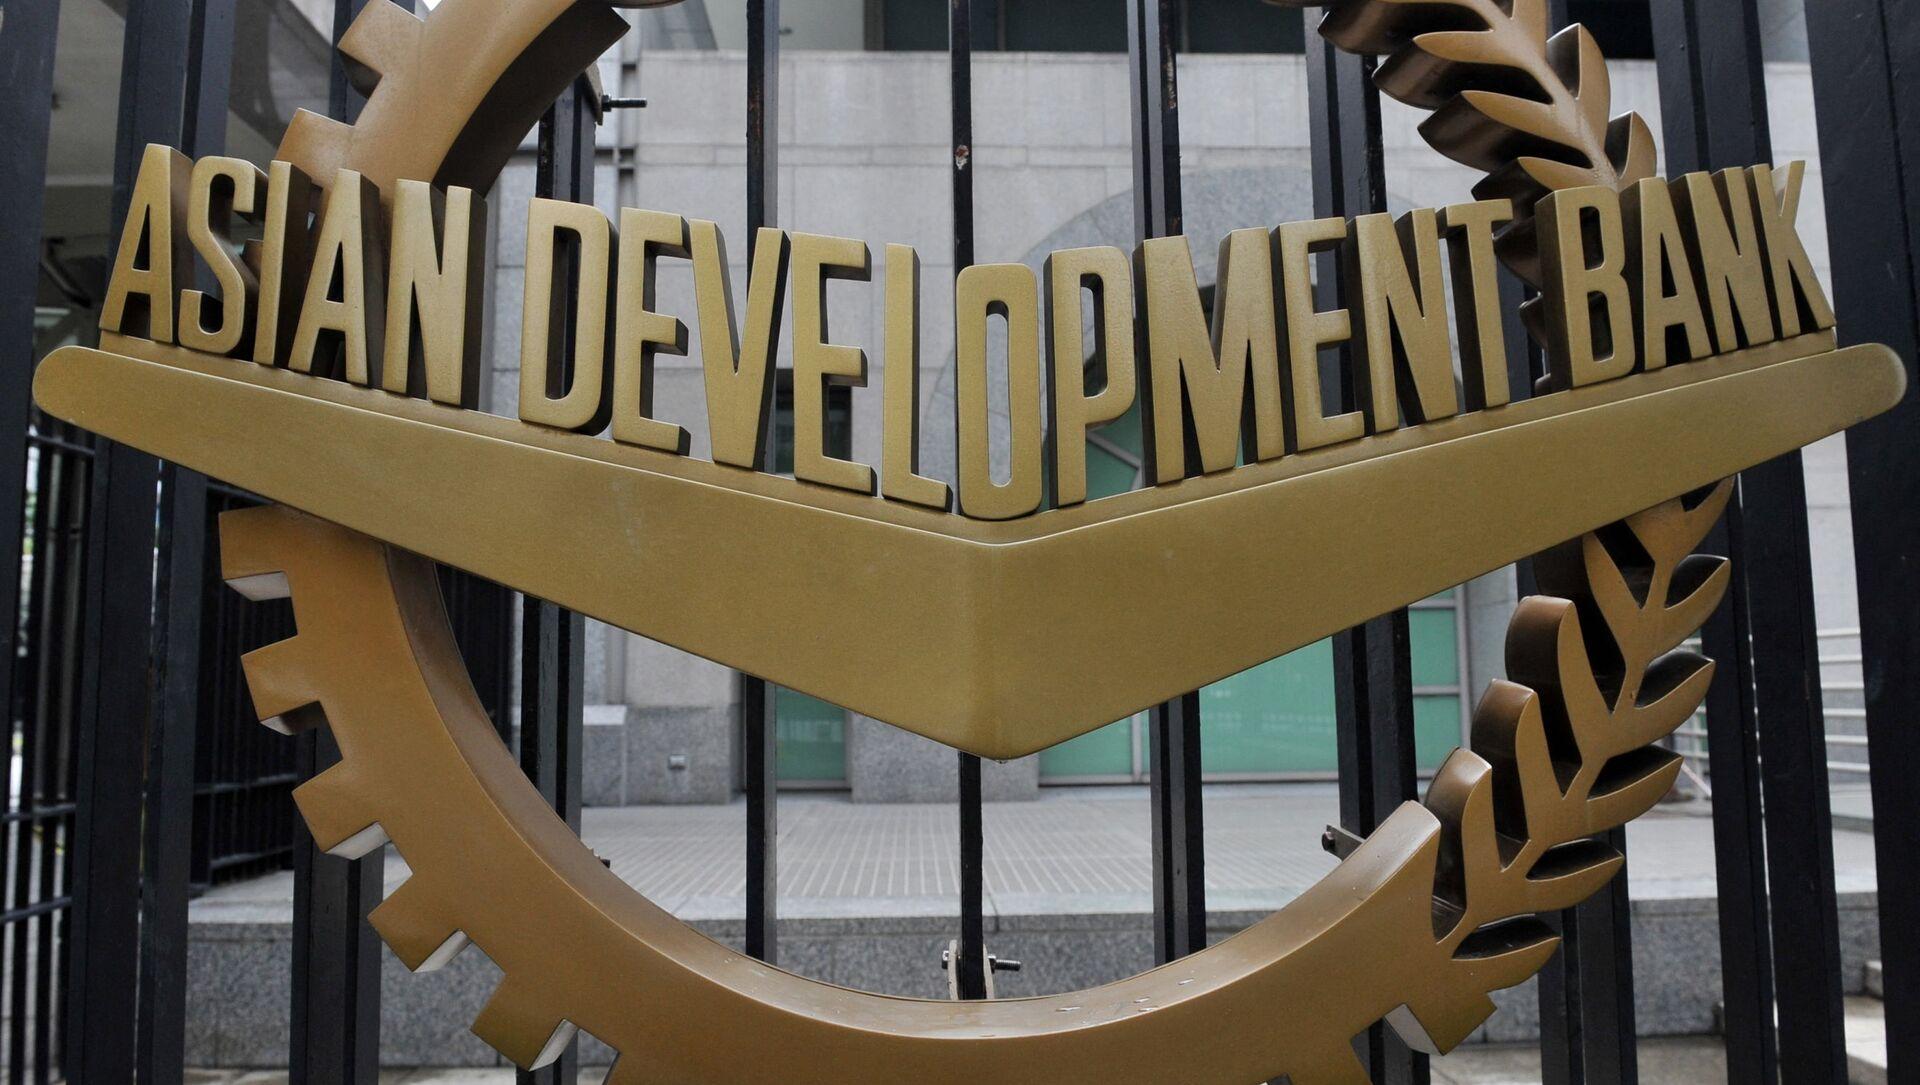 Asian Development Bank (ADB). - Sputnik Việt Nam, 1920, 22.09.2021